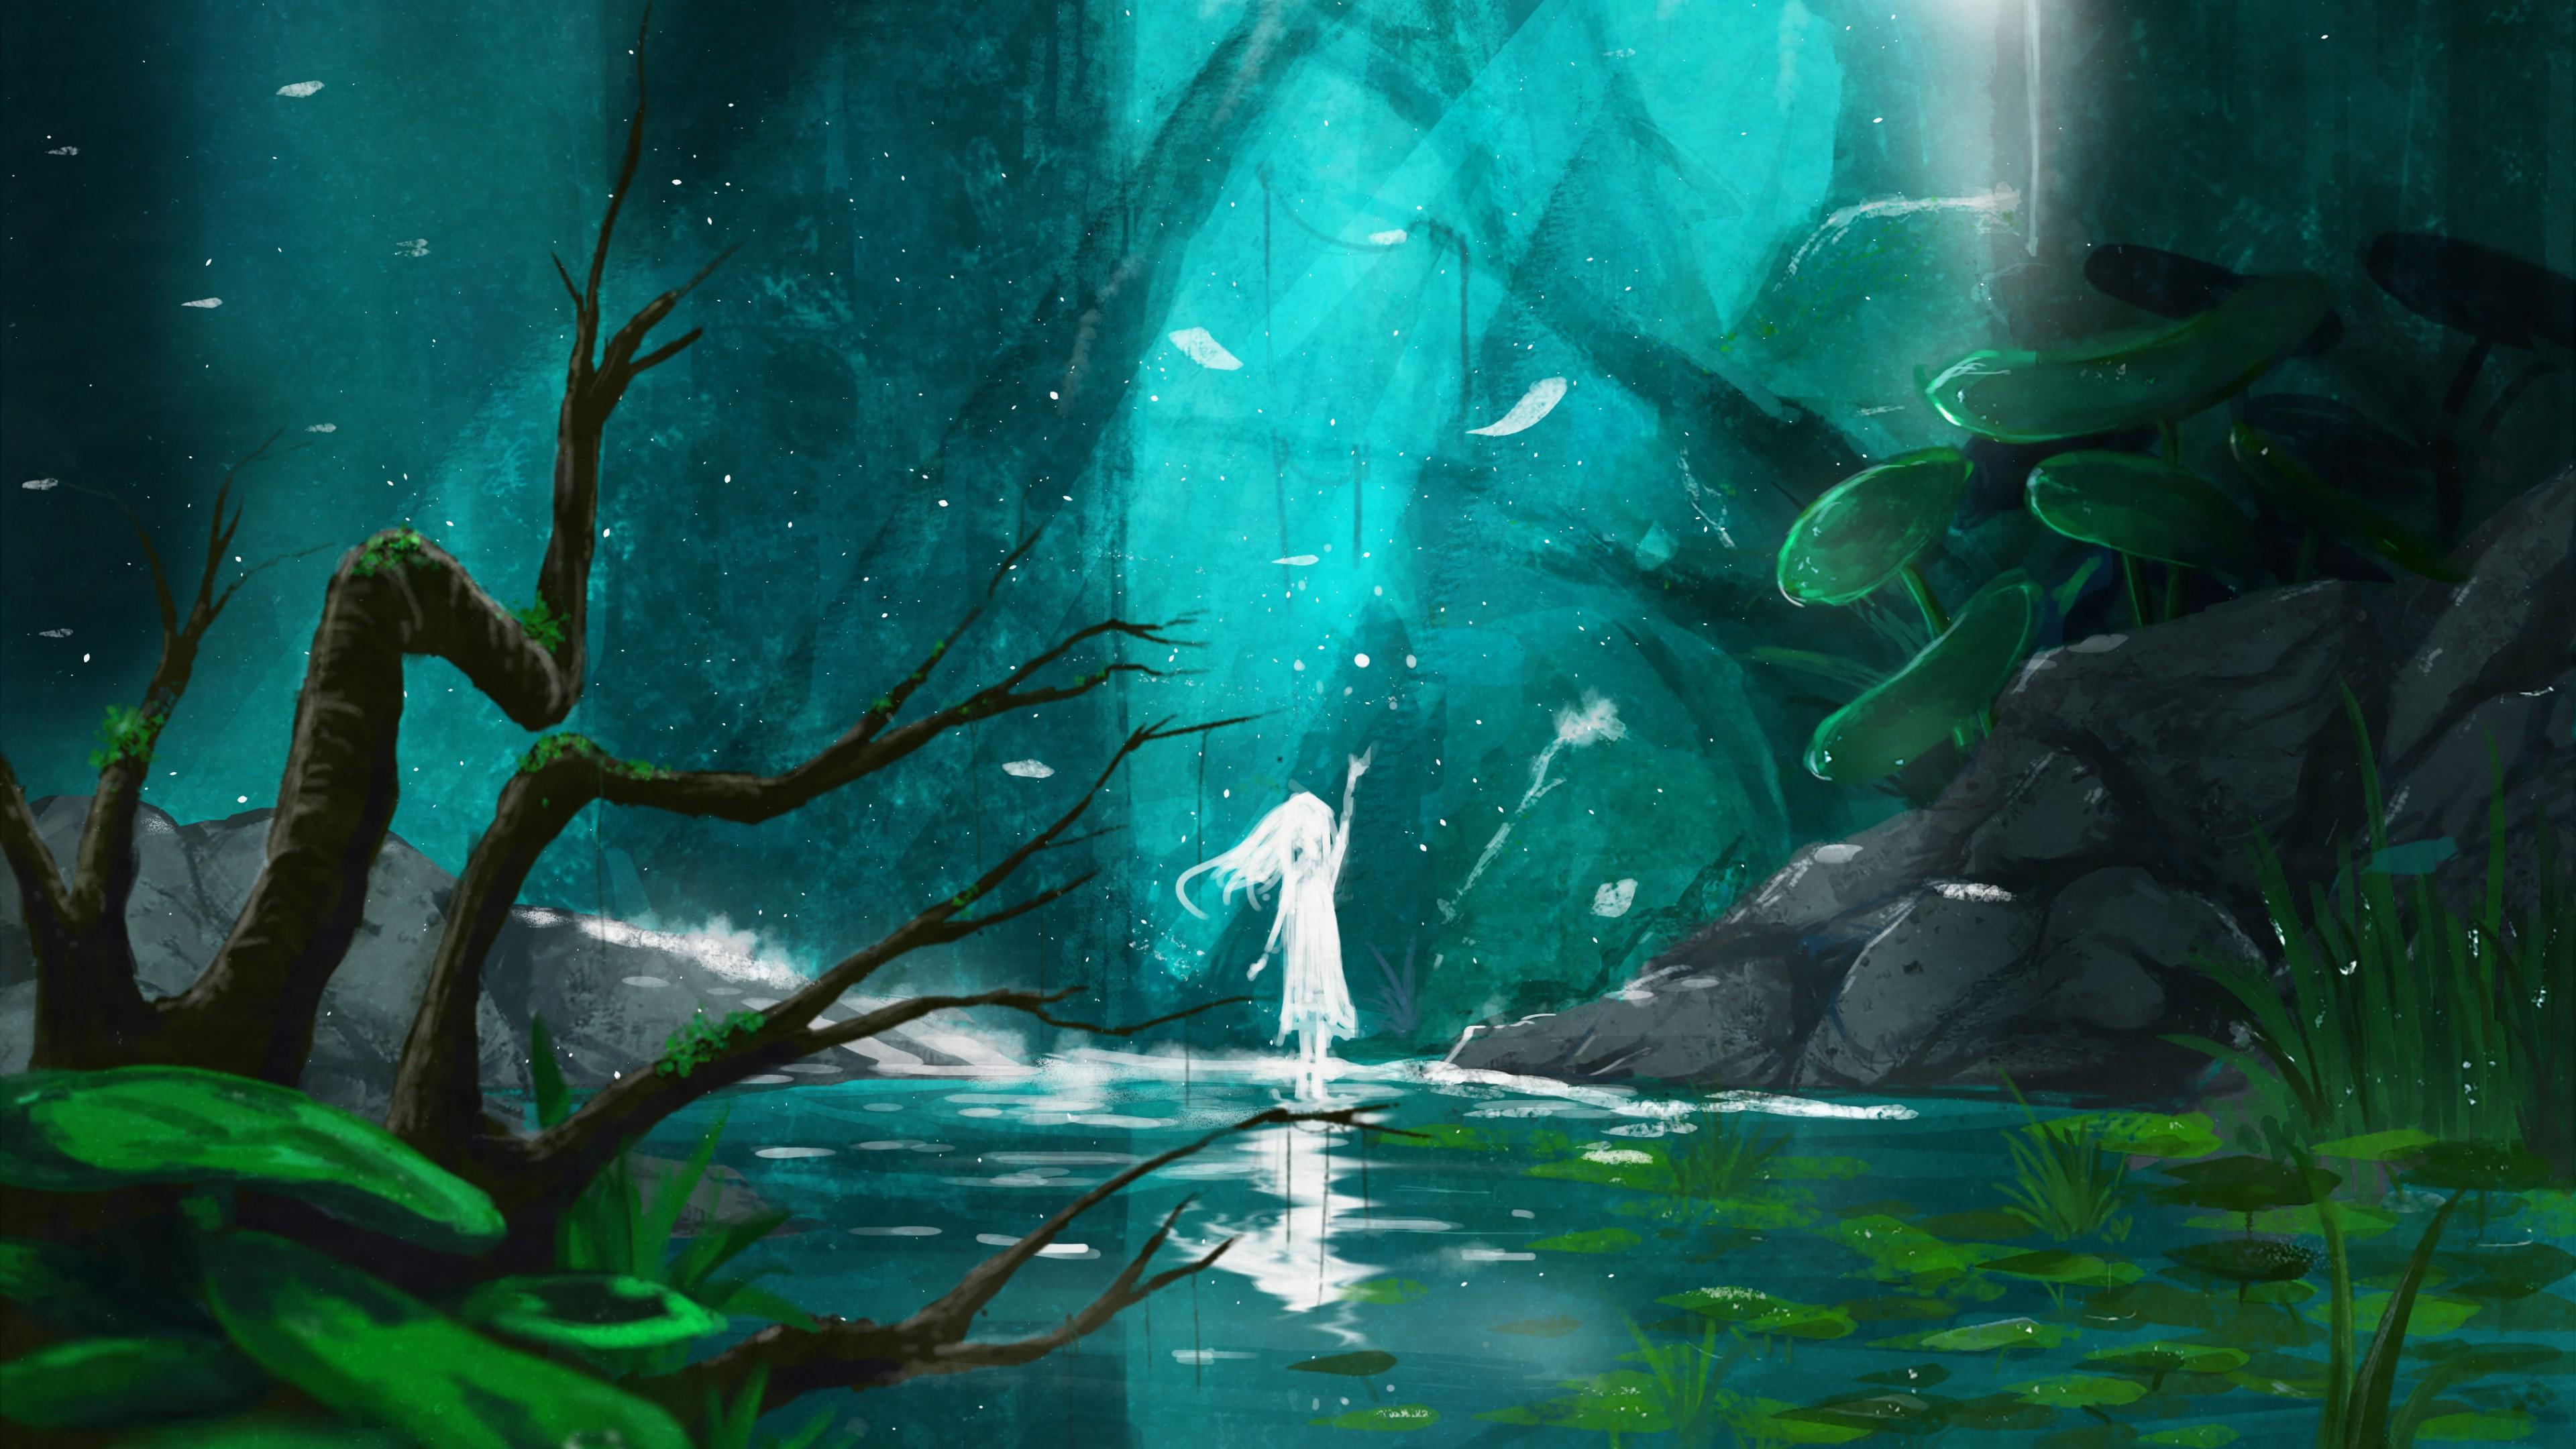 Wallpaper Girl Fantasy Forest World 4k Art 18538 Page 2